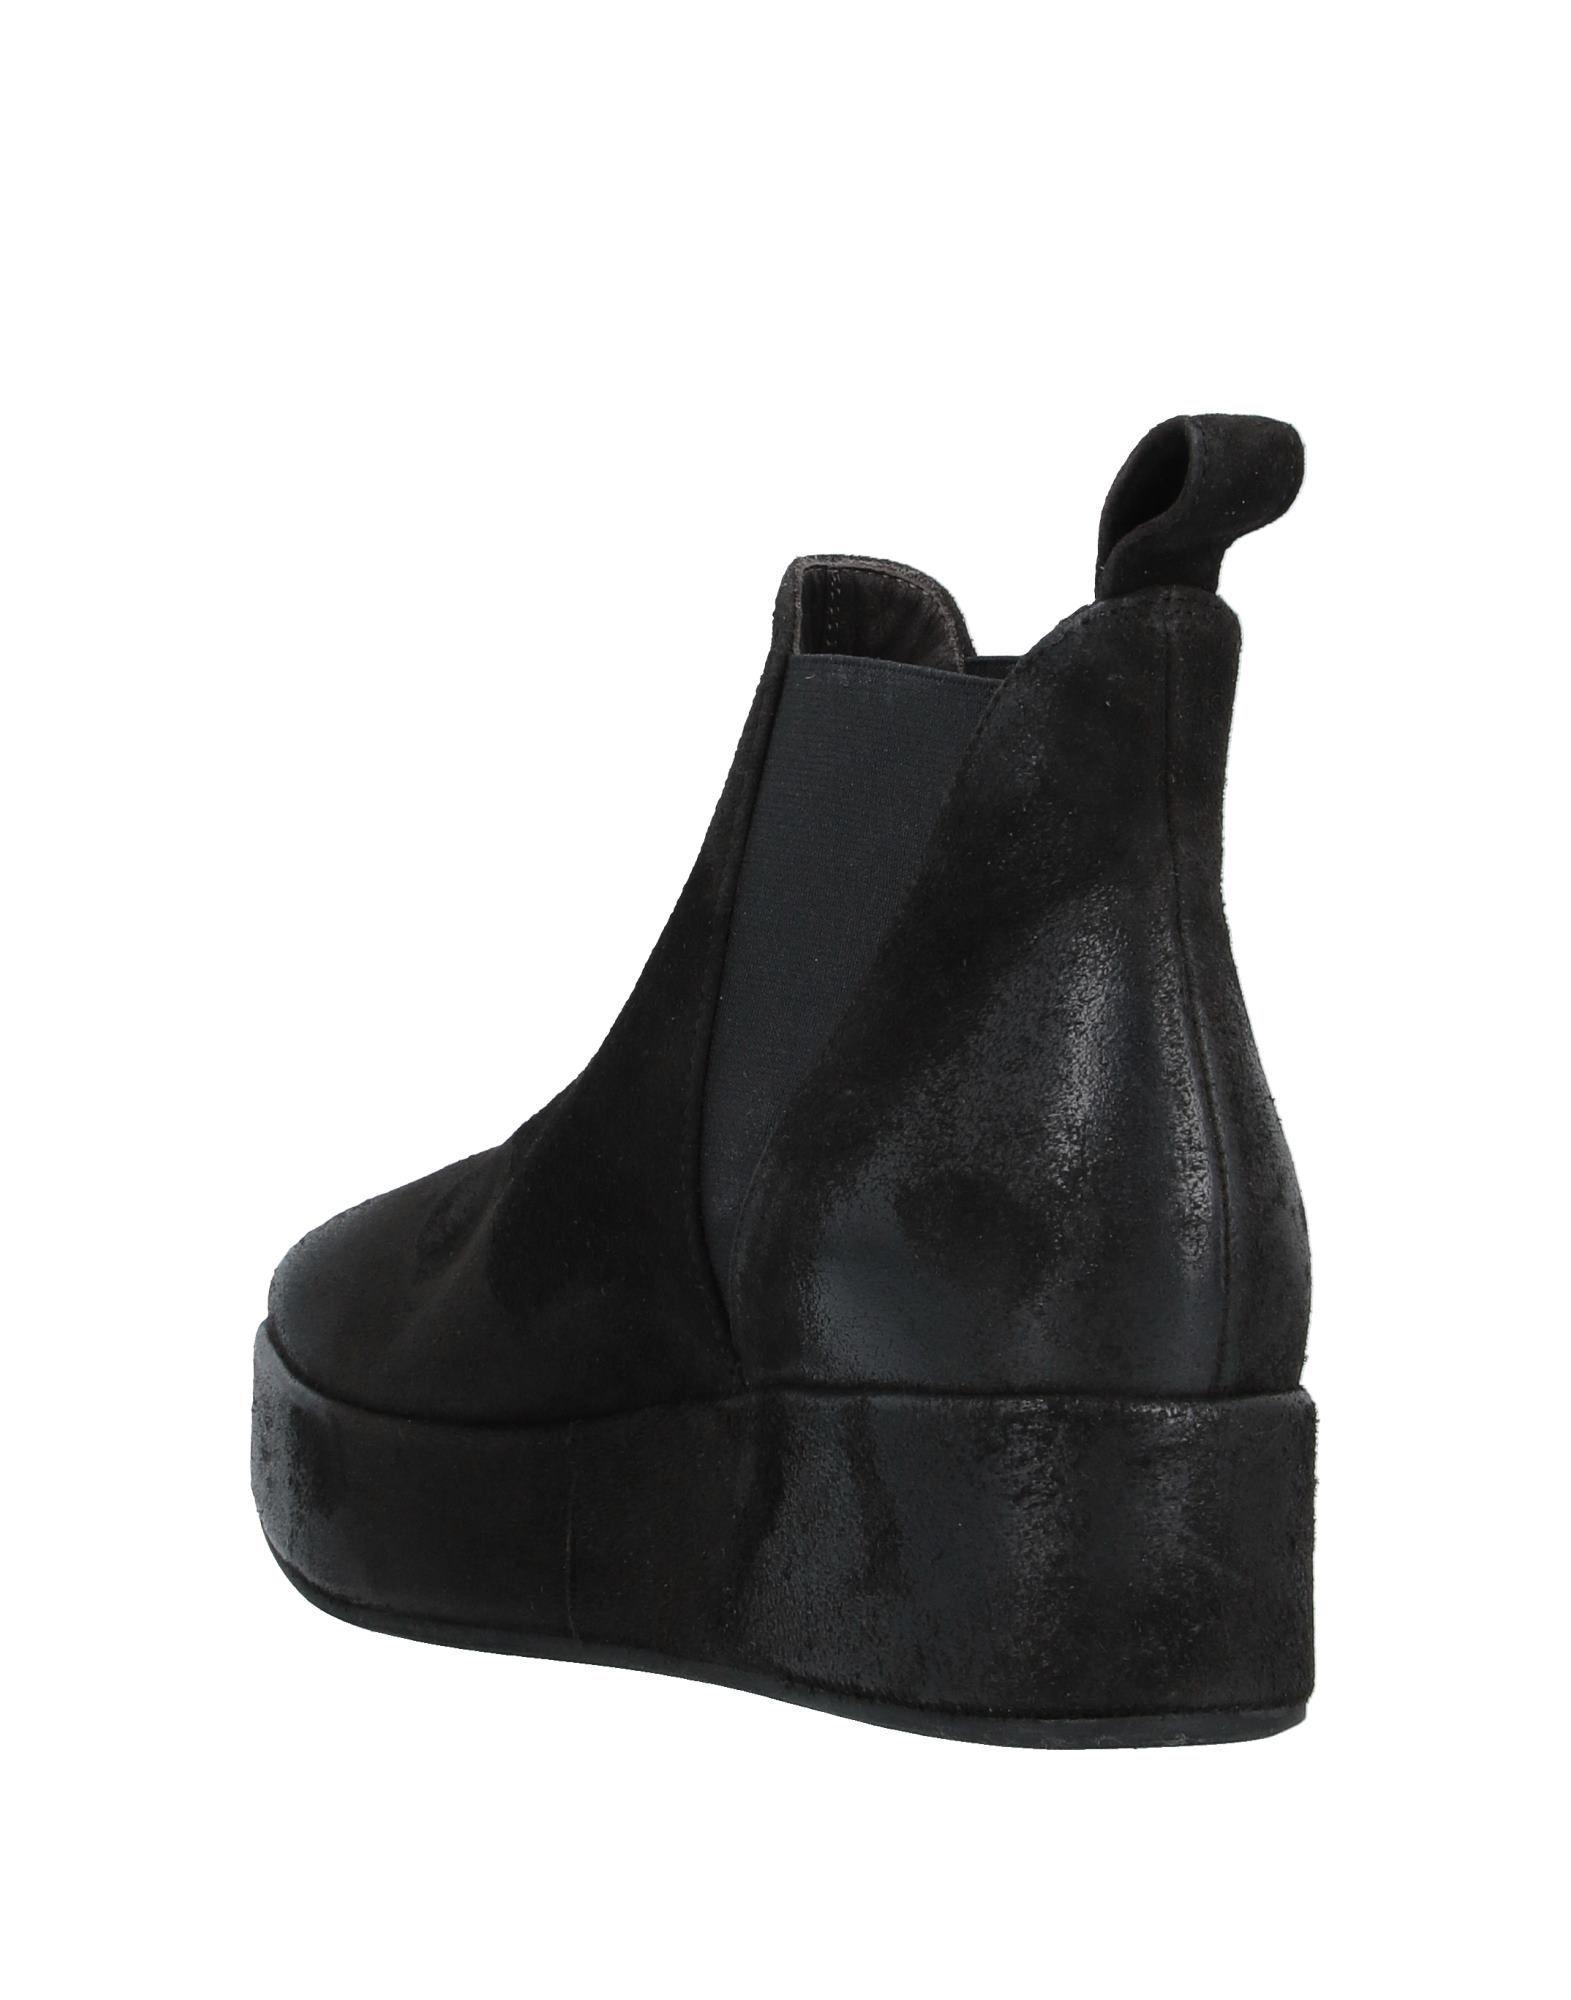 Marsèll Women's Ankle Boots Black Buck